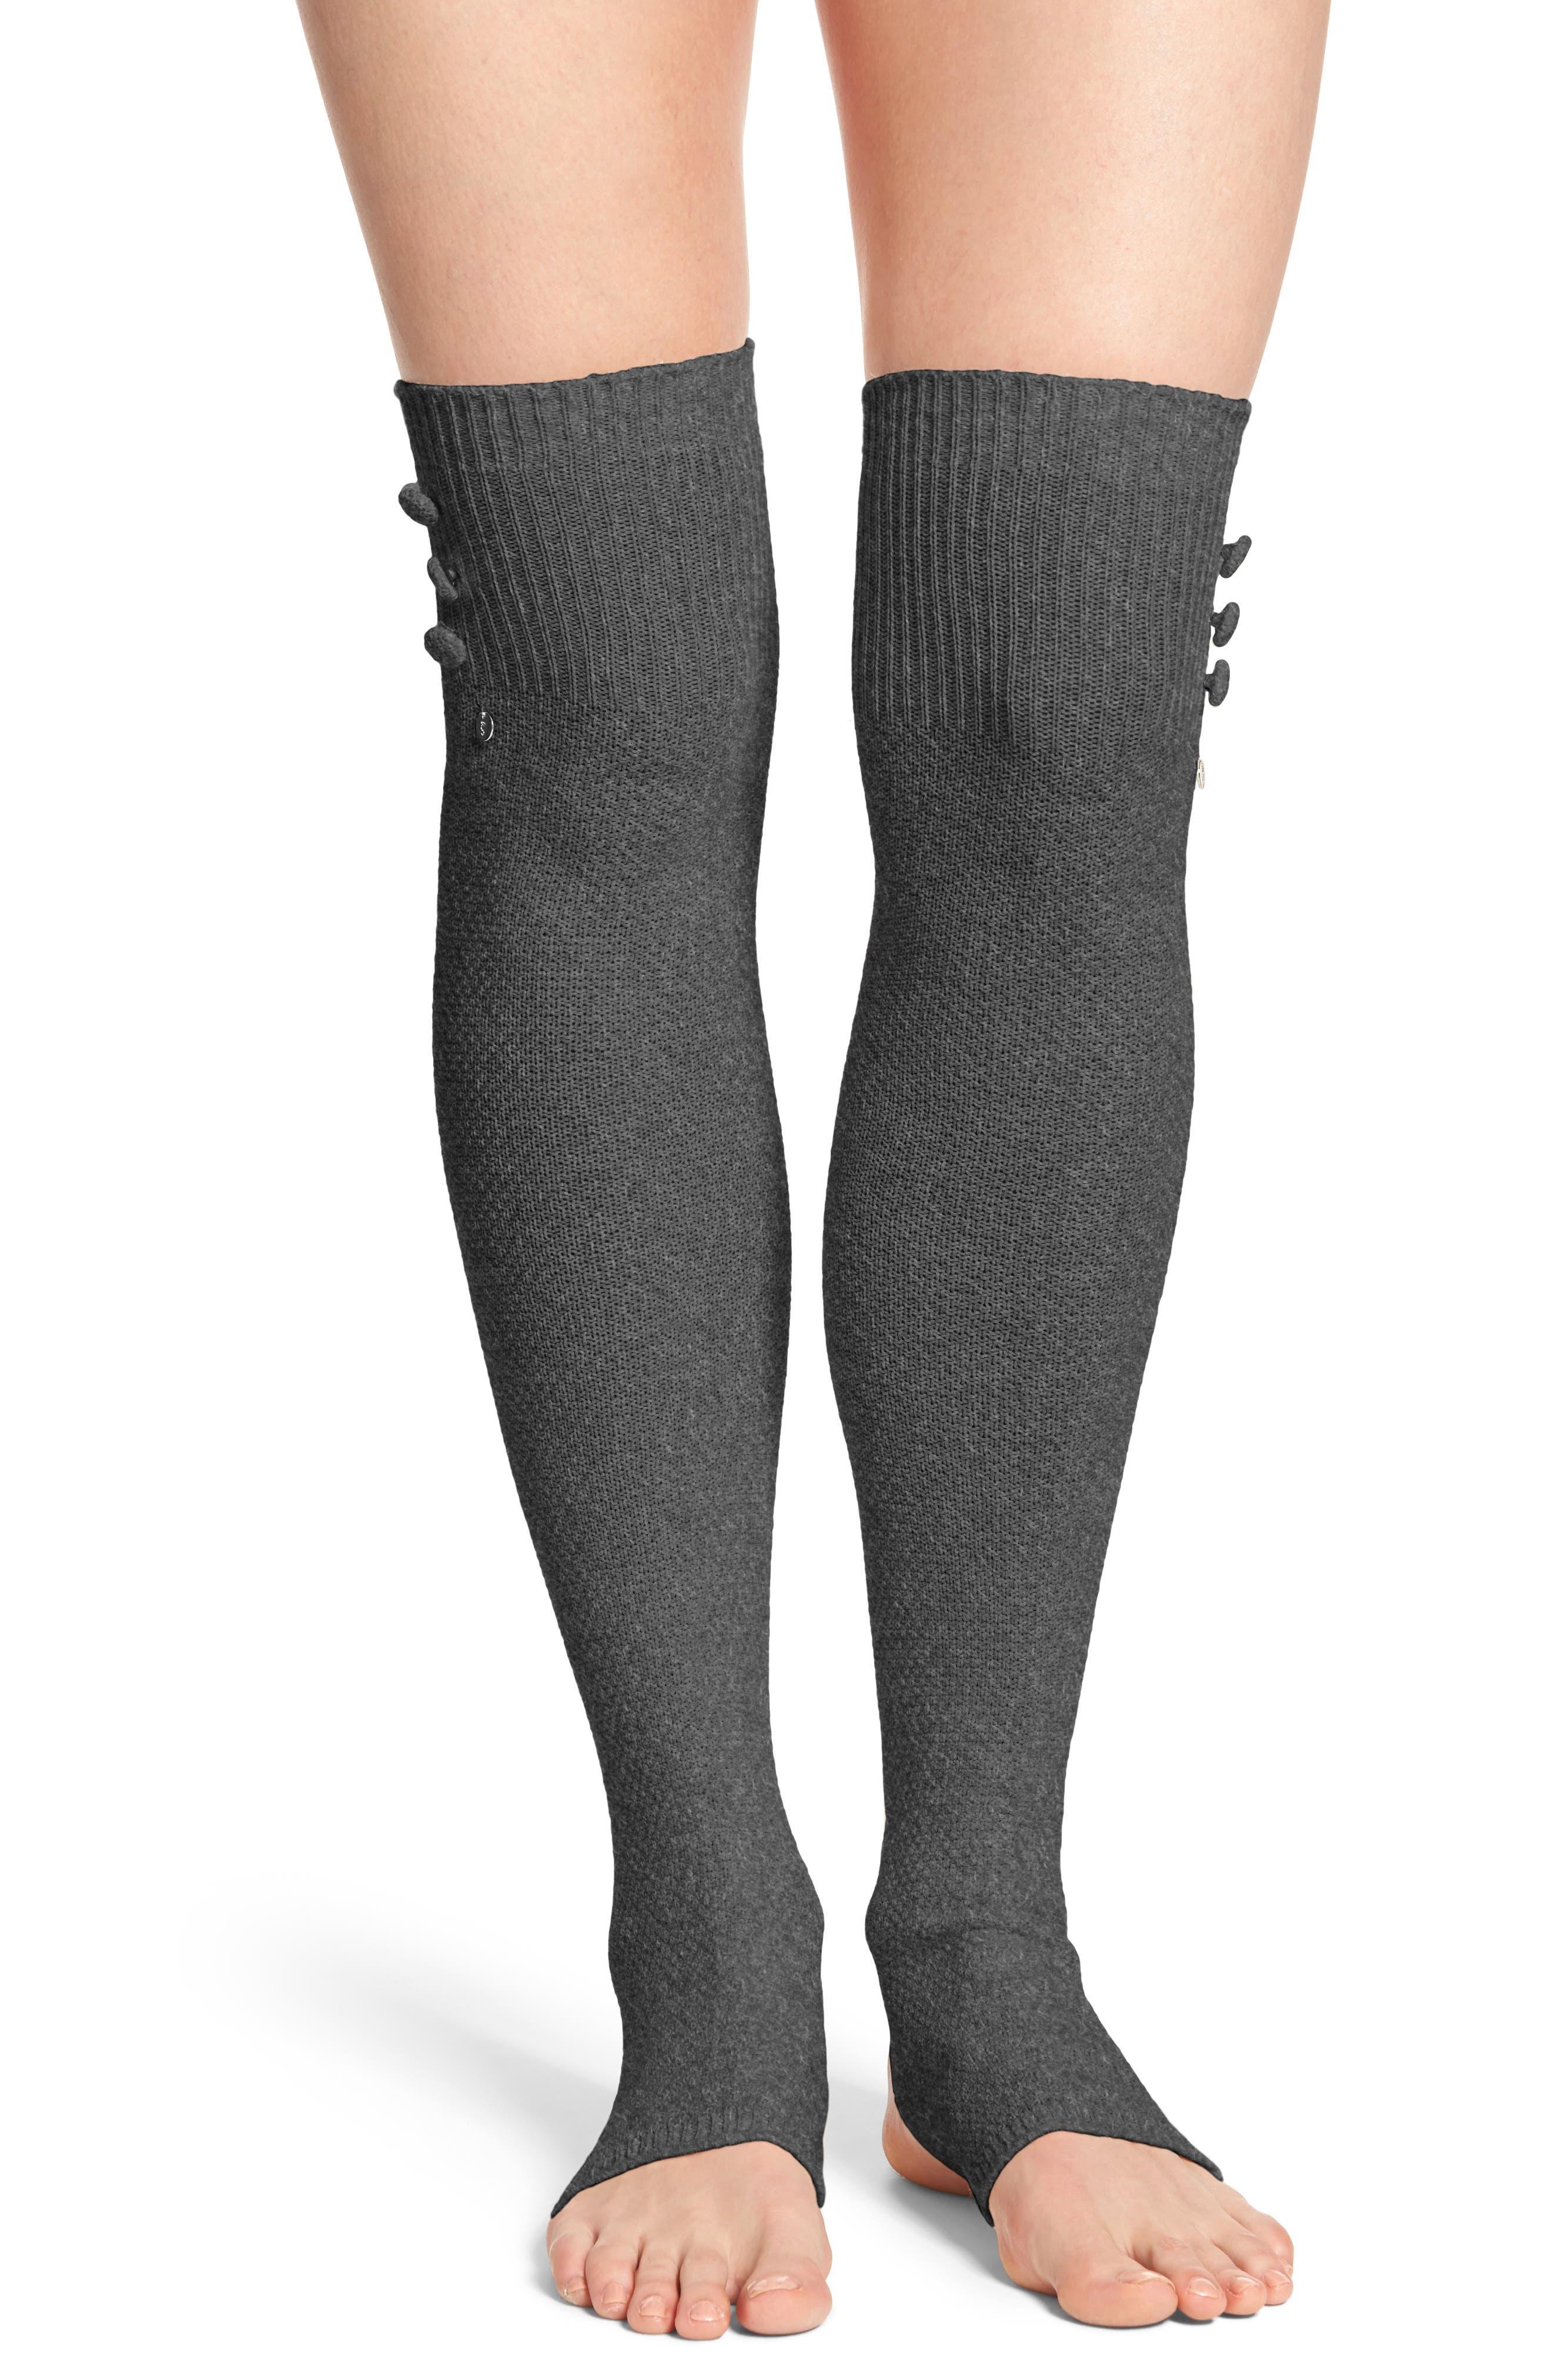 Alternate Image 1 Selected - ToeSox Rae Leg Warmers